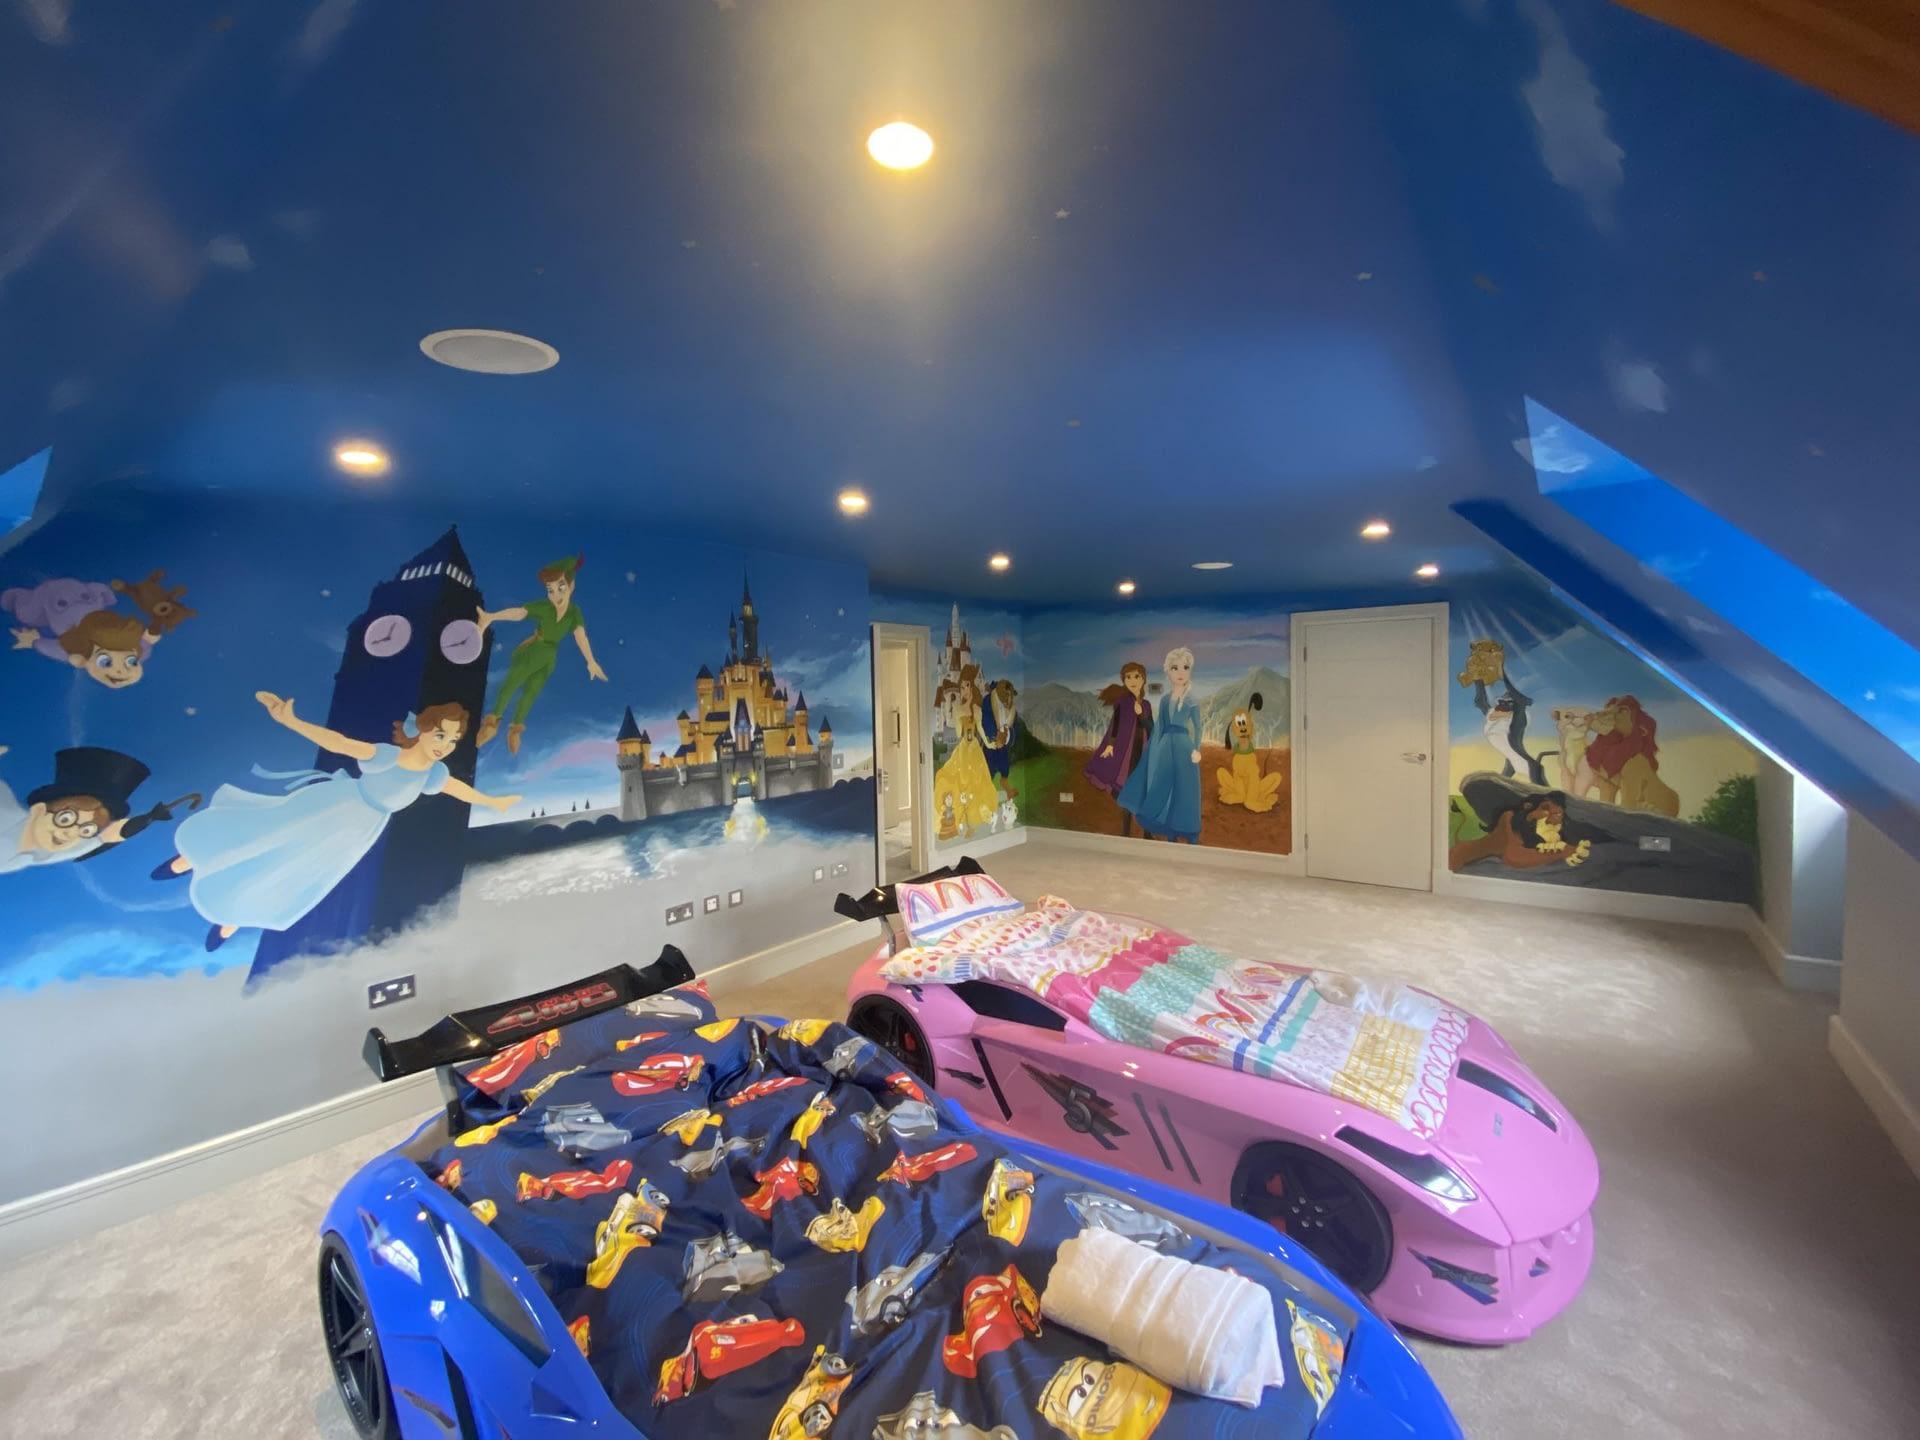 Disney Room